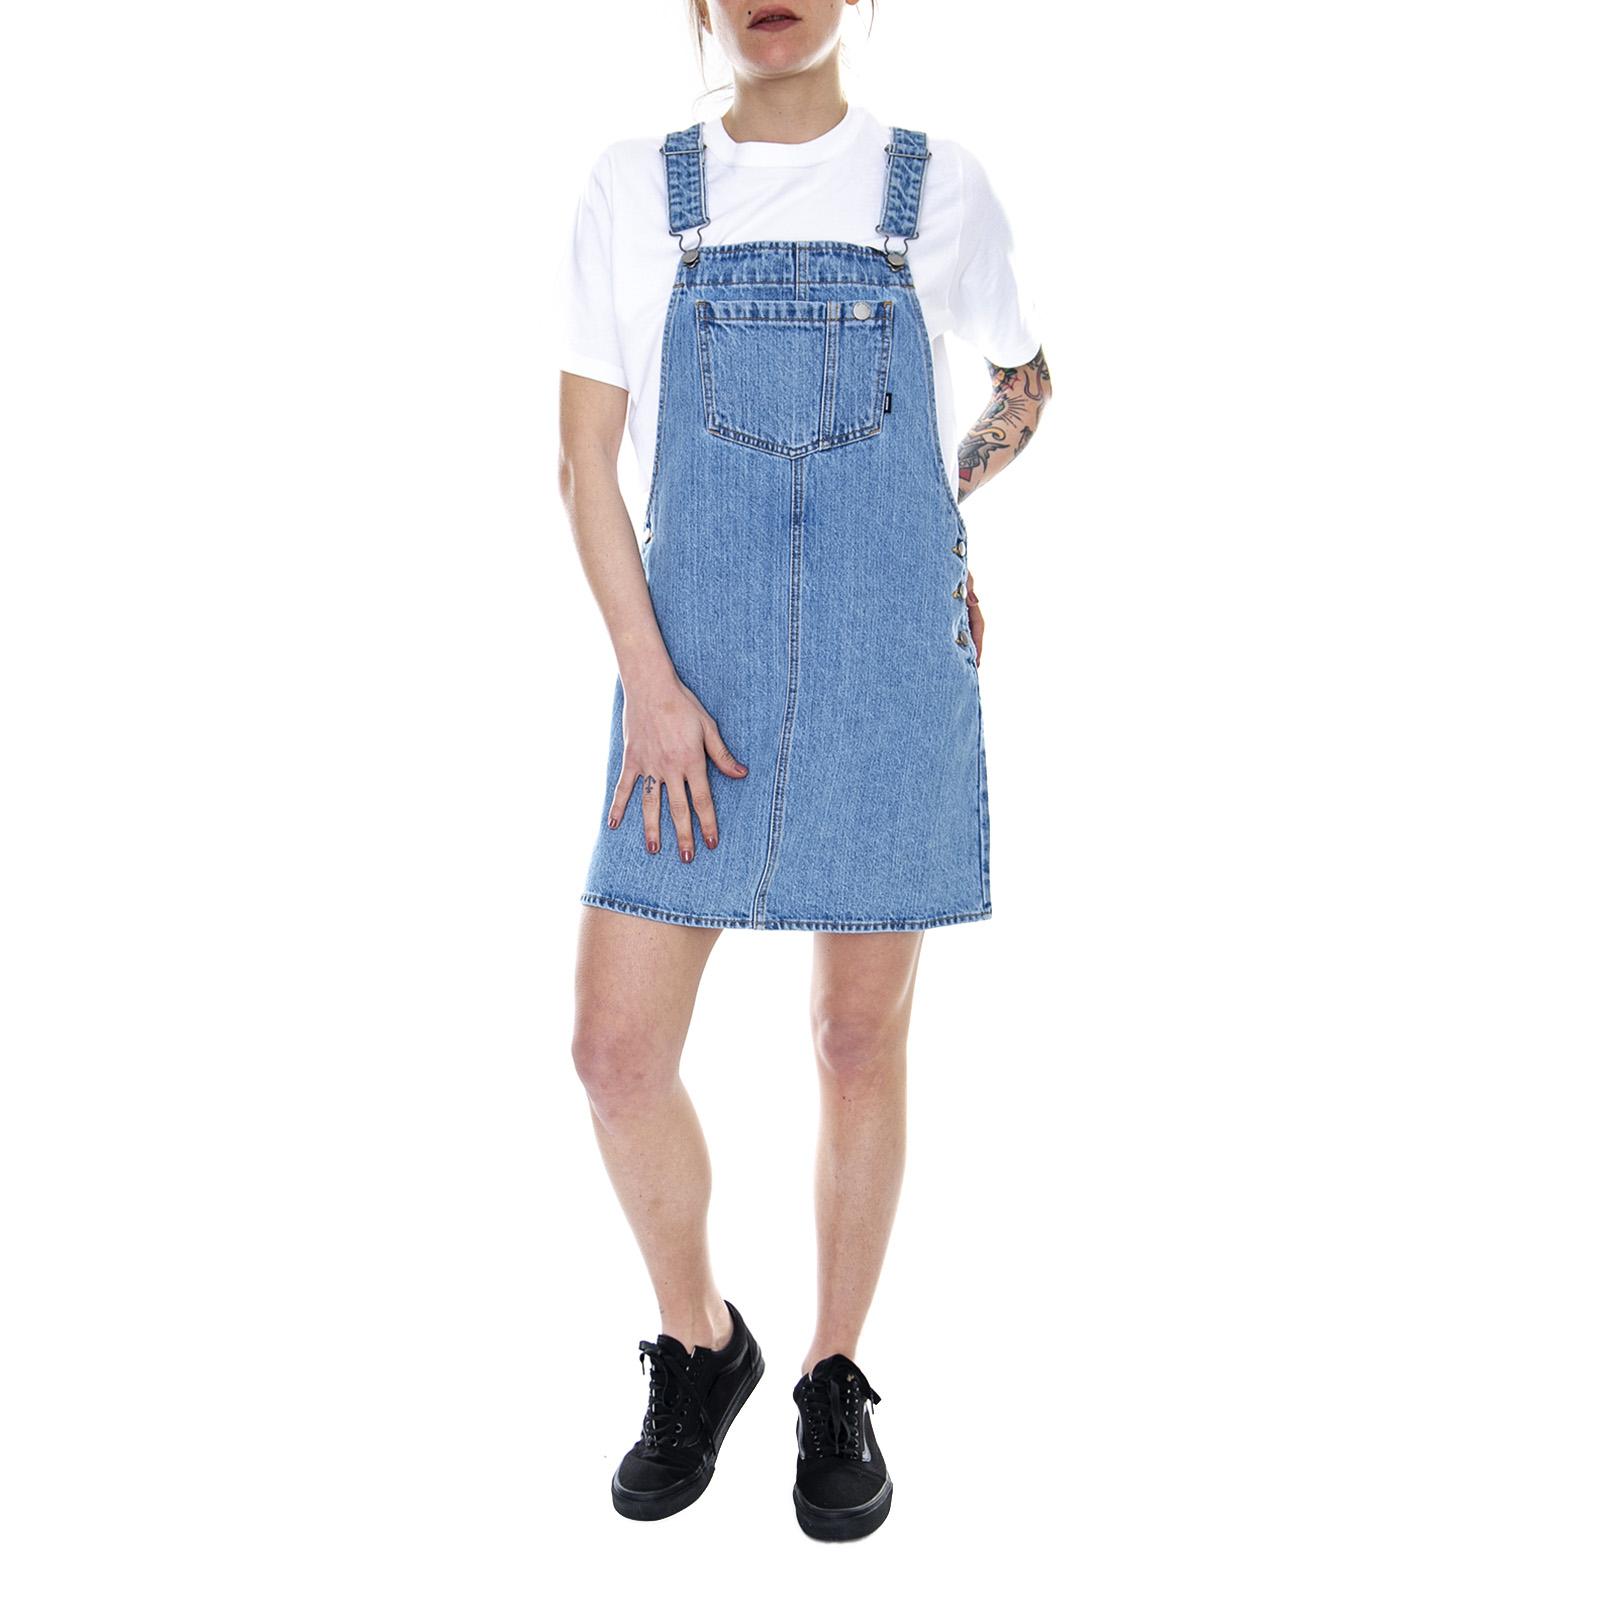 e7d66fb2d772 Dr. Denim Eir Dungaree Dress Summer Camp - Blue - Abito Salopette Donn Blue